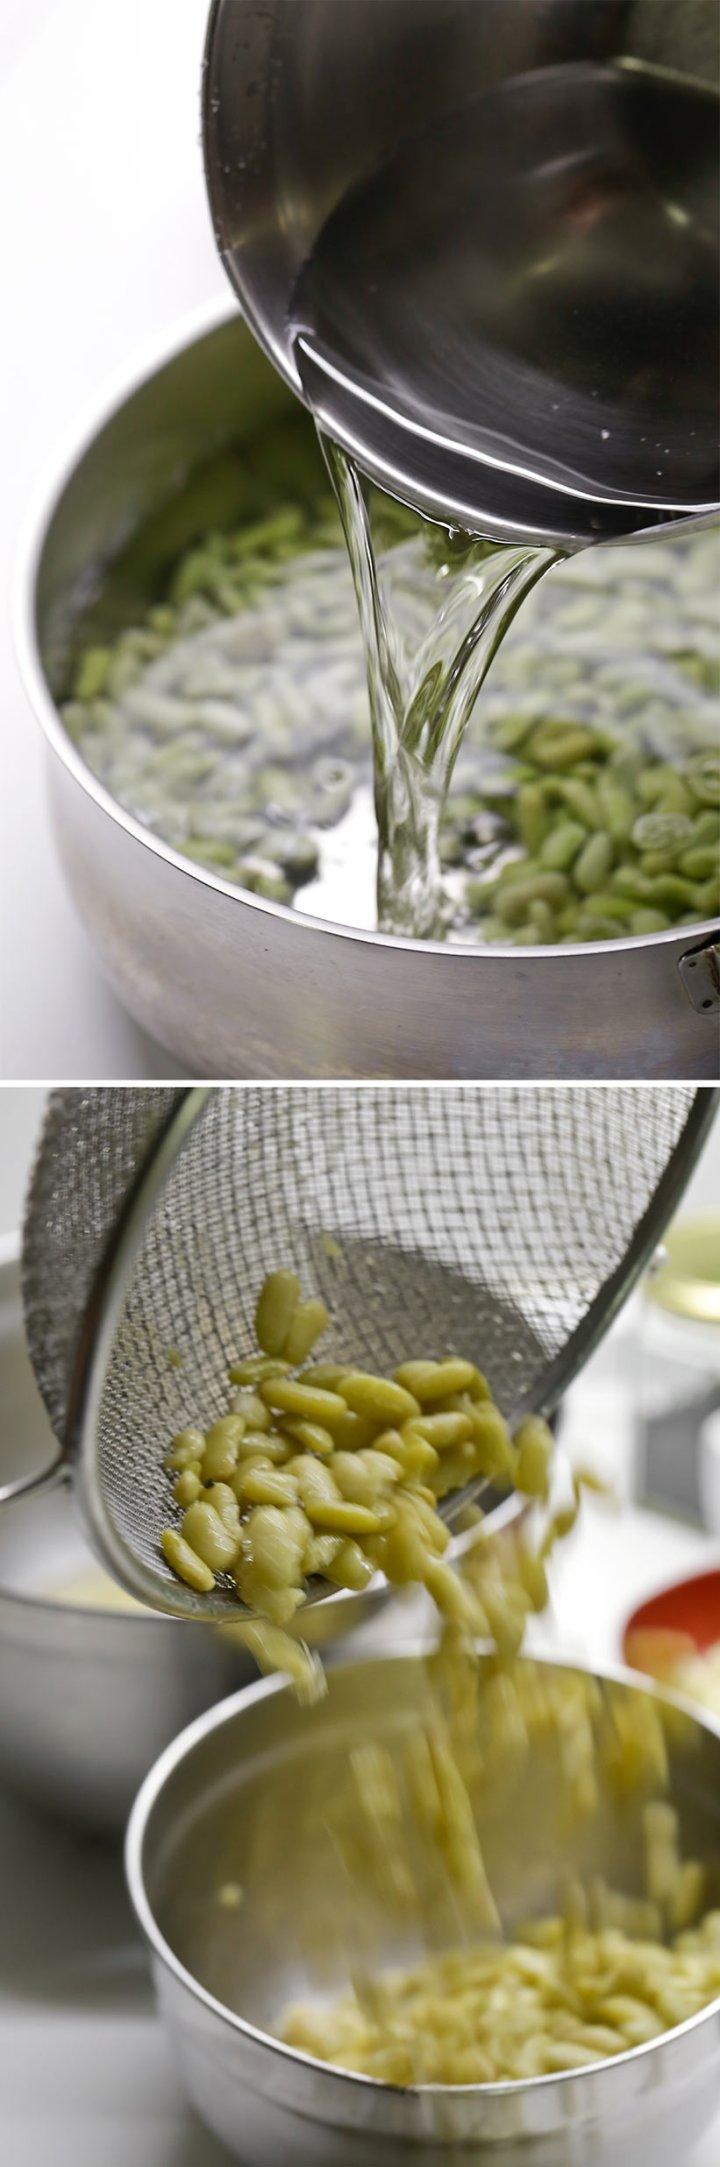 Receta de puré de verdinas con langostinos g